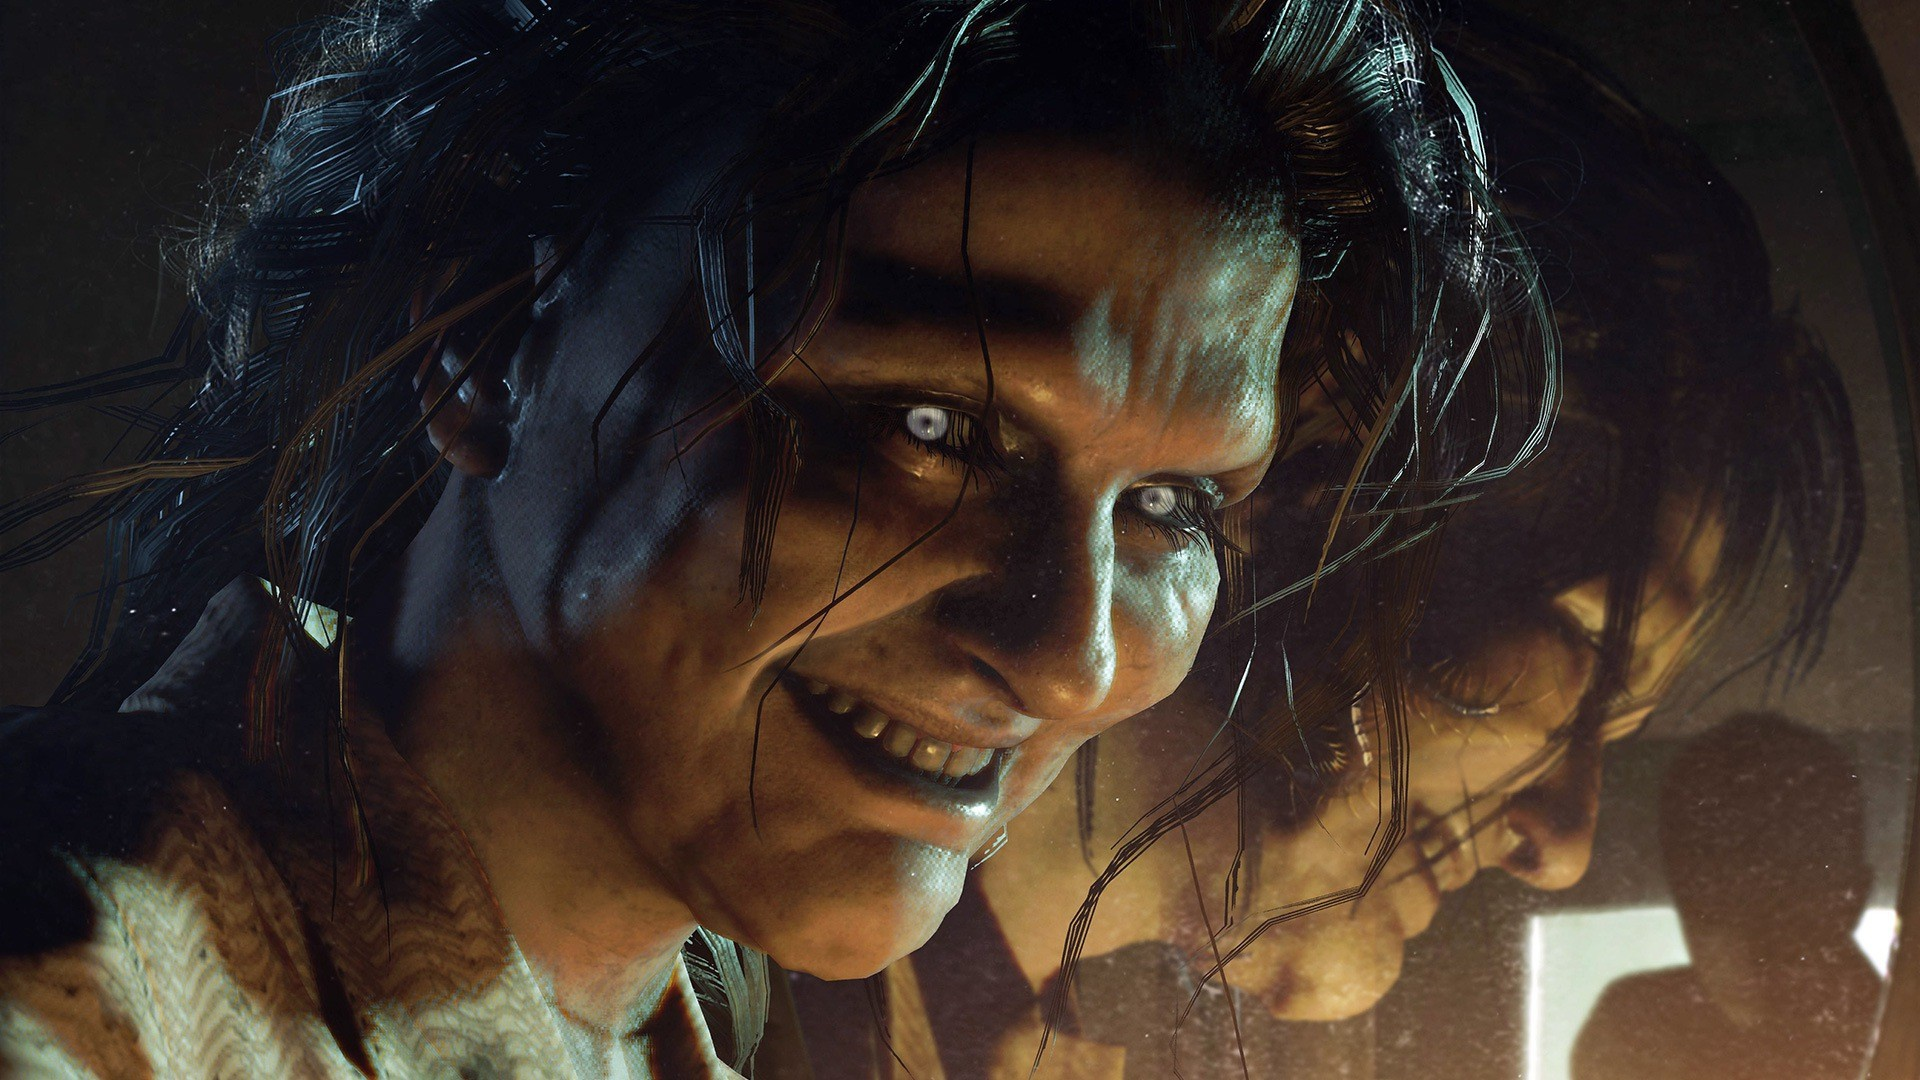 Resident Evil 7 Biohazard Hd Wallpaper Background Image